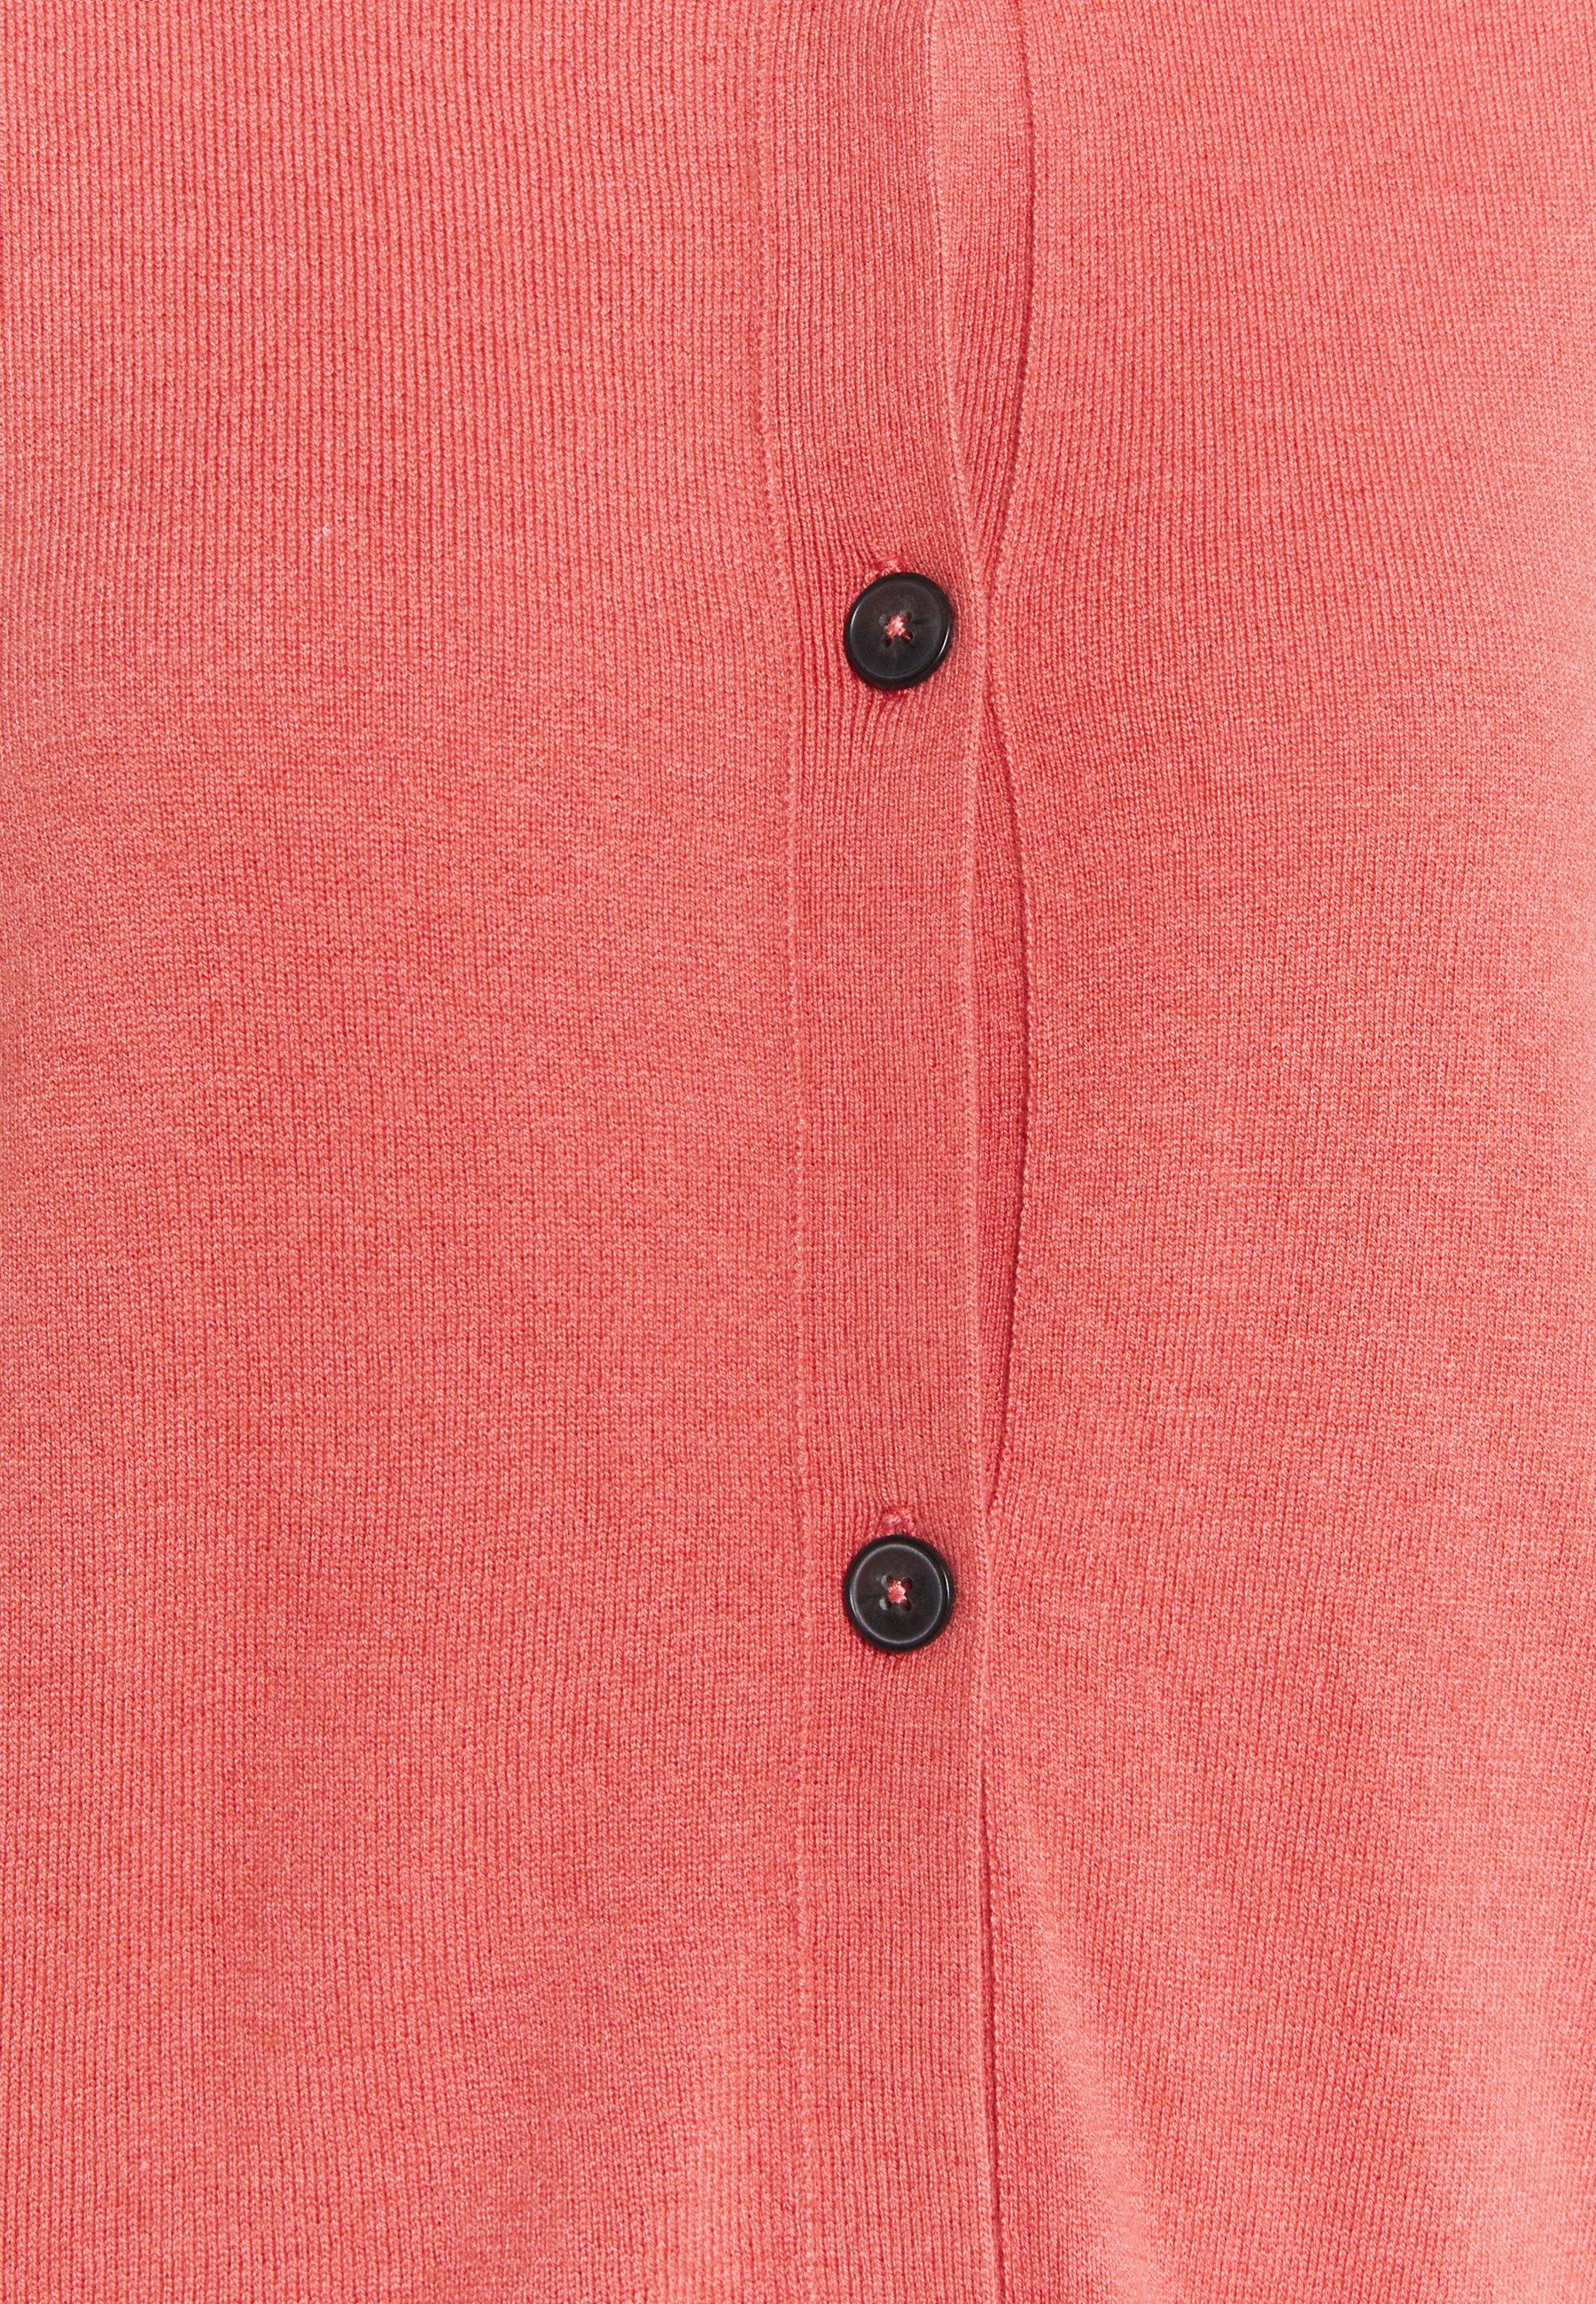 Marc O'polo Cardigan Longsleeve Button Closure Saddle Shoulder - Hazy Peach/oransje